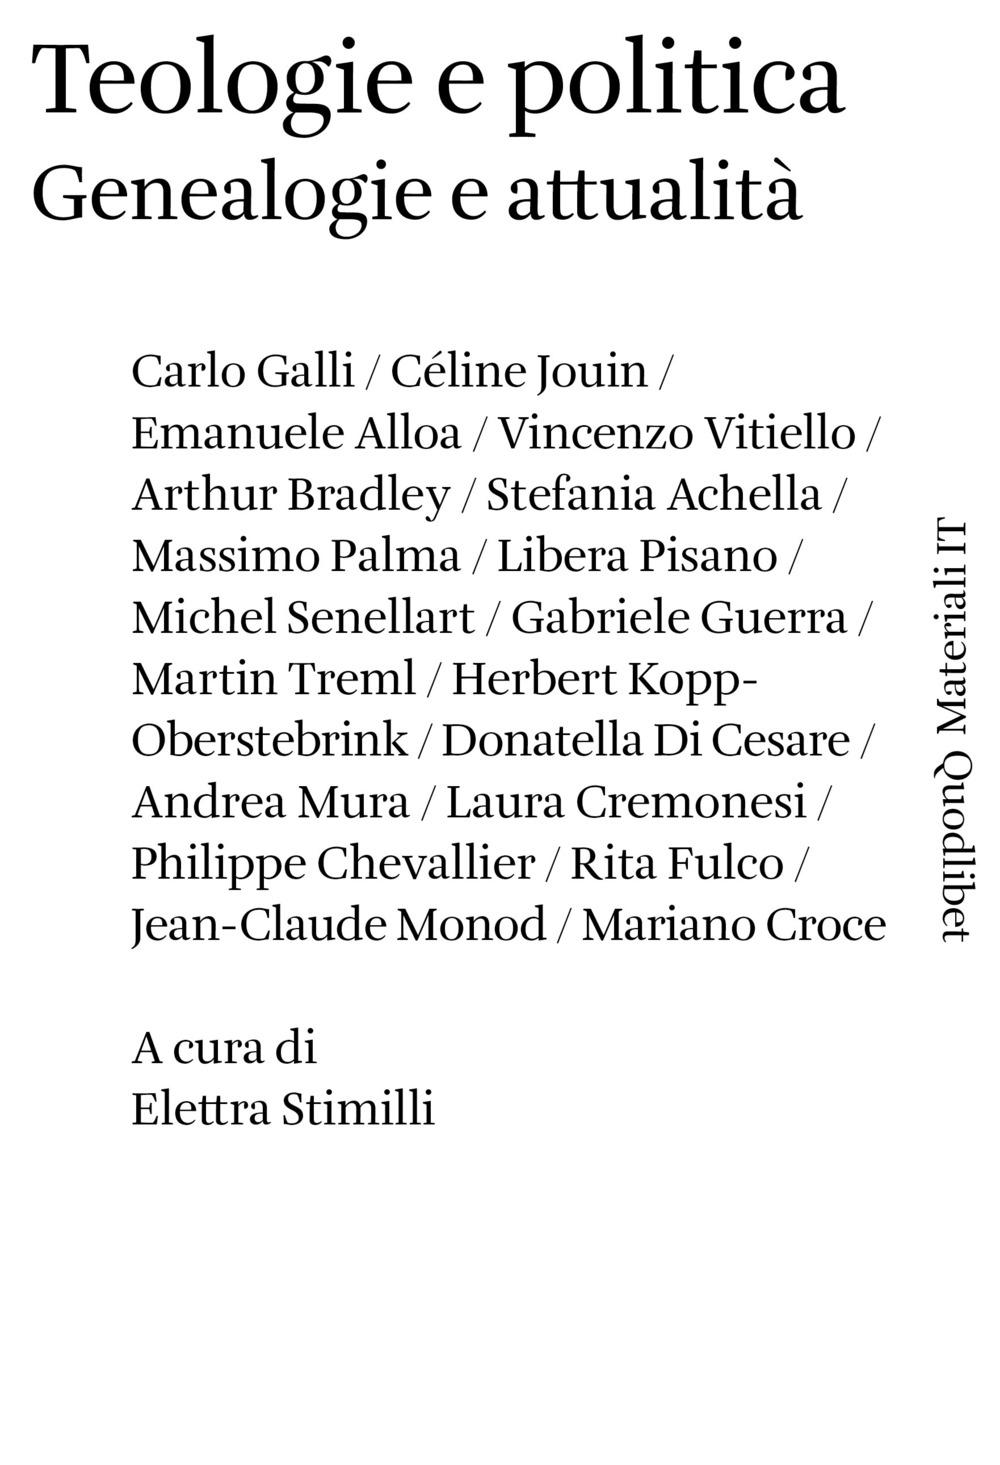 Teologie e politica. Genealogie e attualità - Stimilli E. (cur.) - 9788822902429